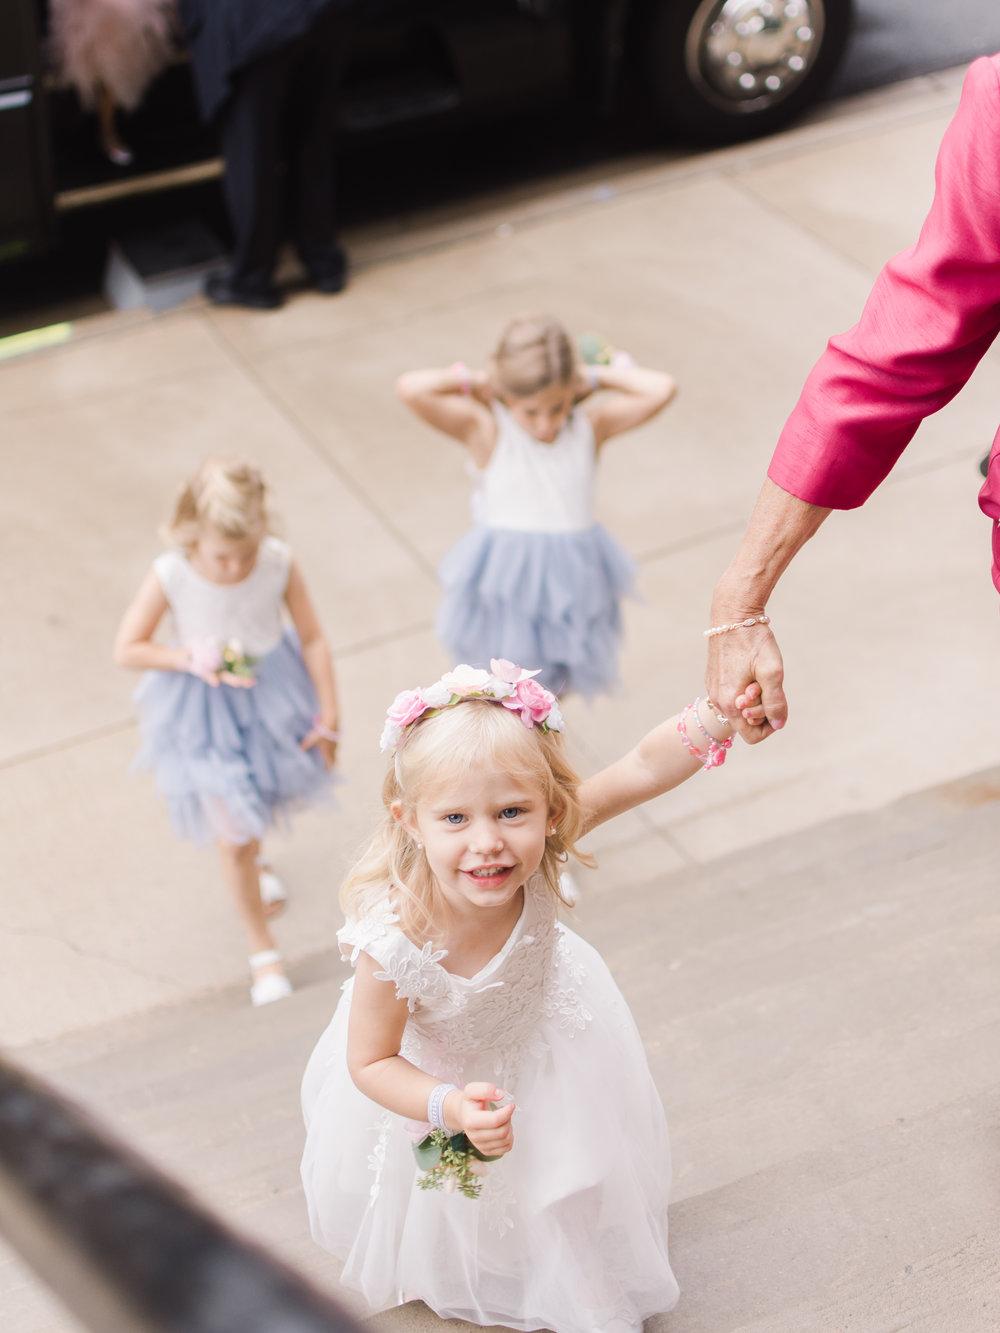 Jacqueline Anne Photography  - M&B Wedding - 081818-102.jpg